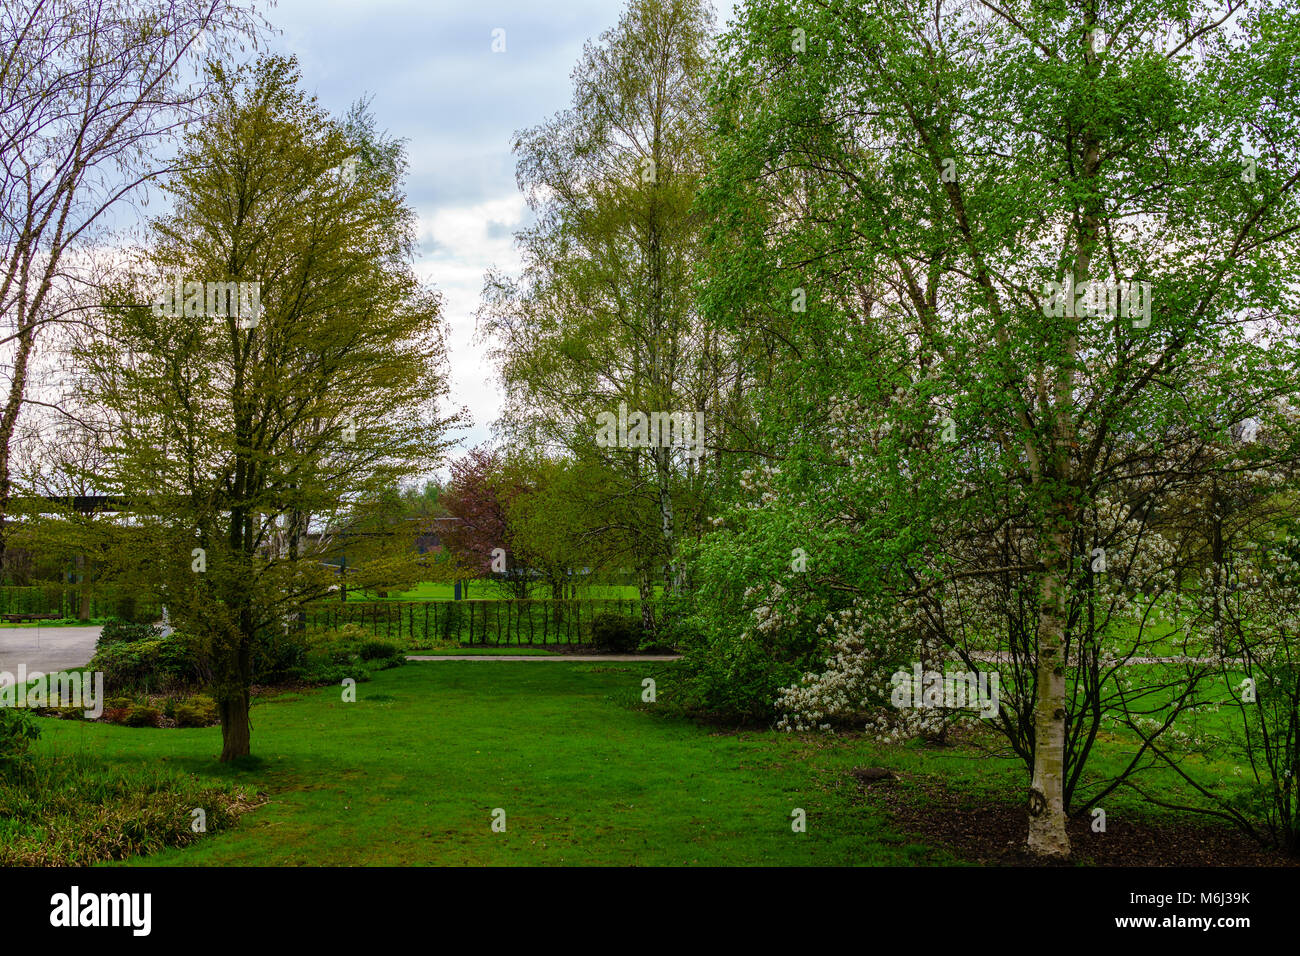 nordsternpark in gelsenkirchen at summer - Stock Image